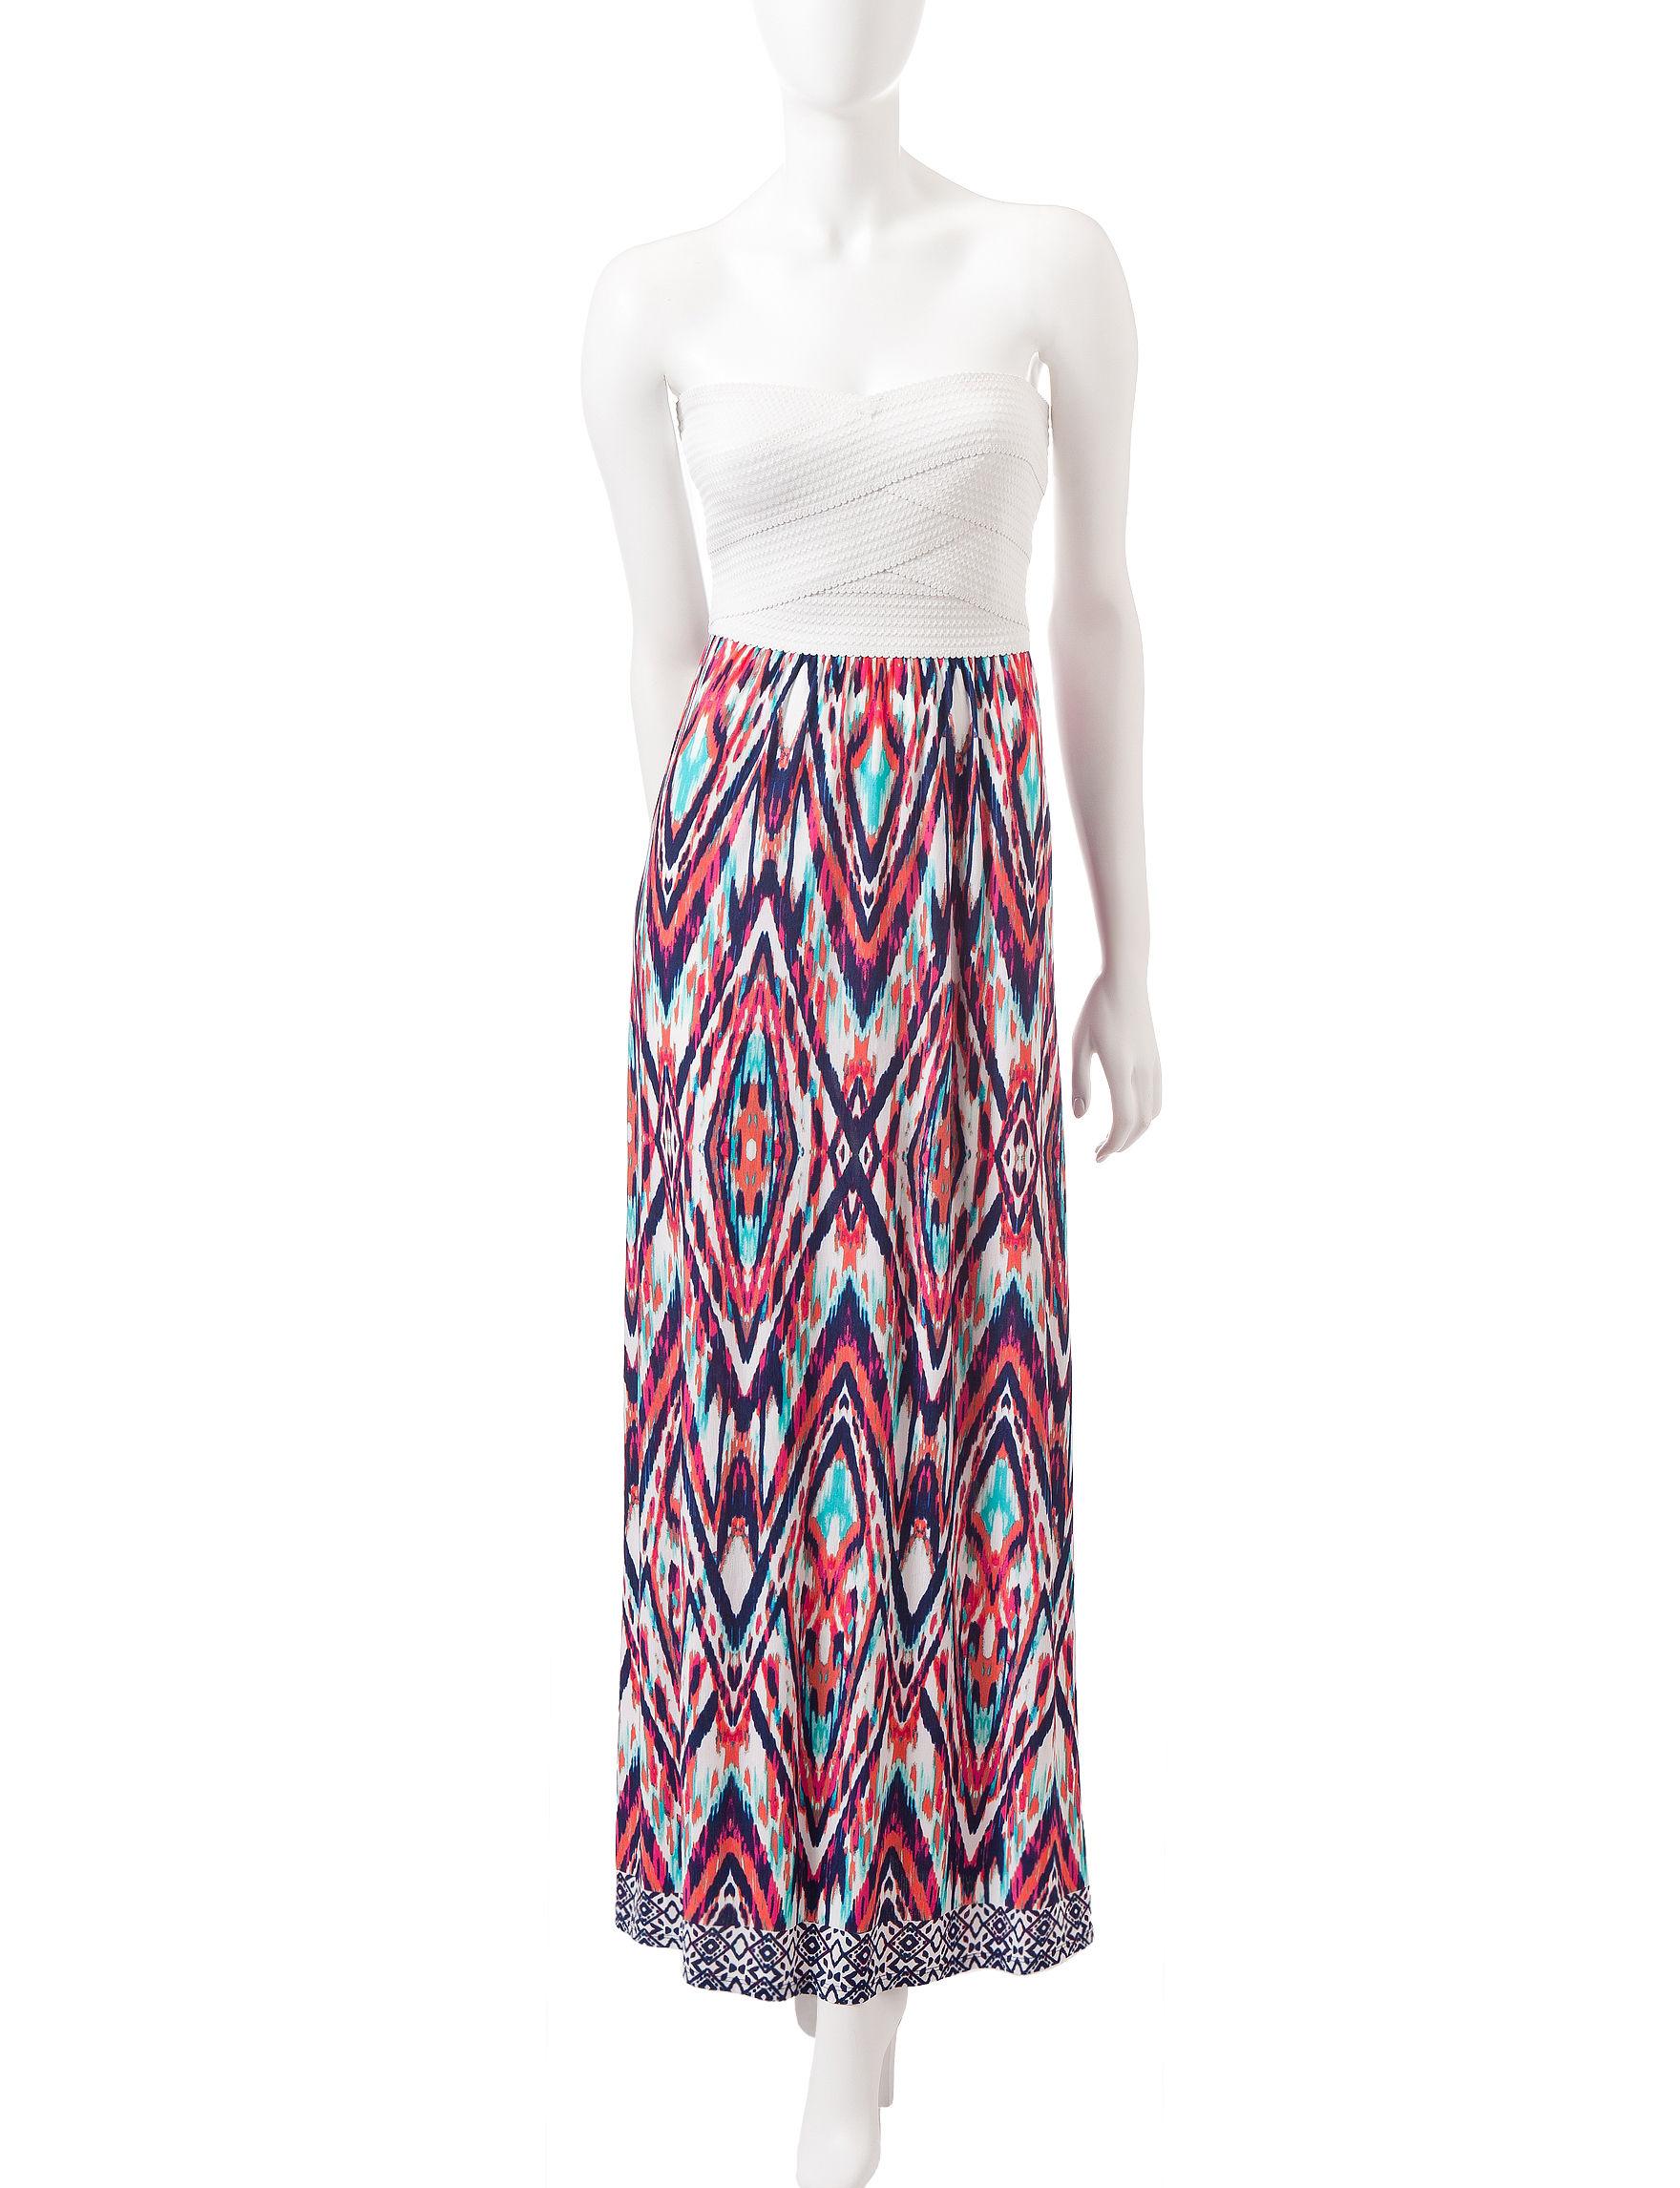 Trixxi Ivory/Navy Everyday & Casual Shift Dresses